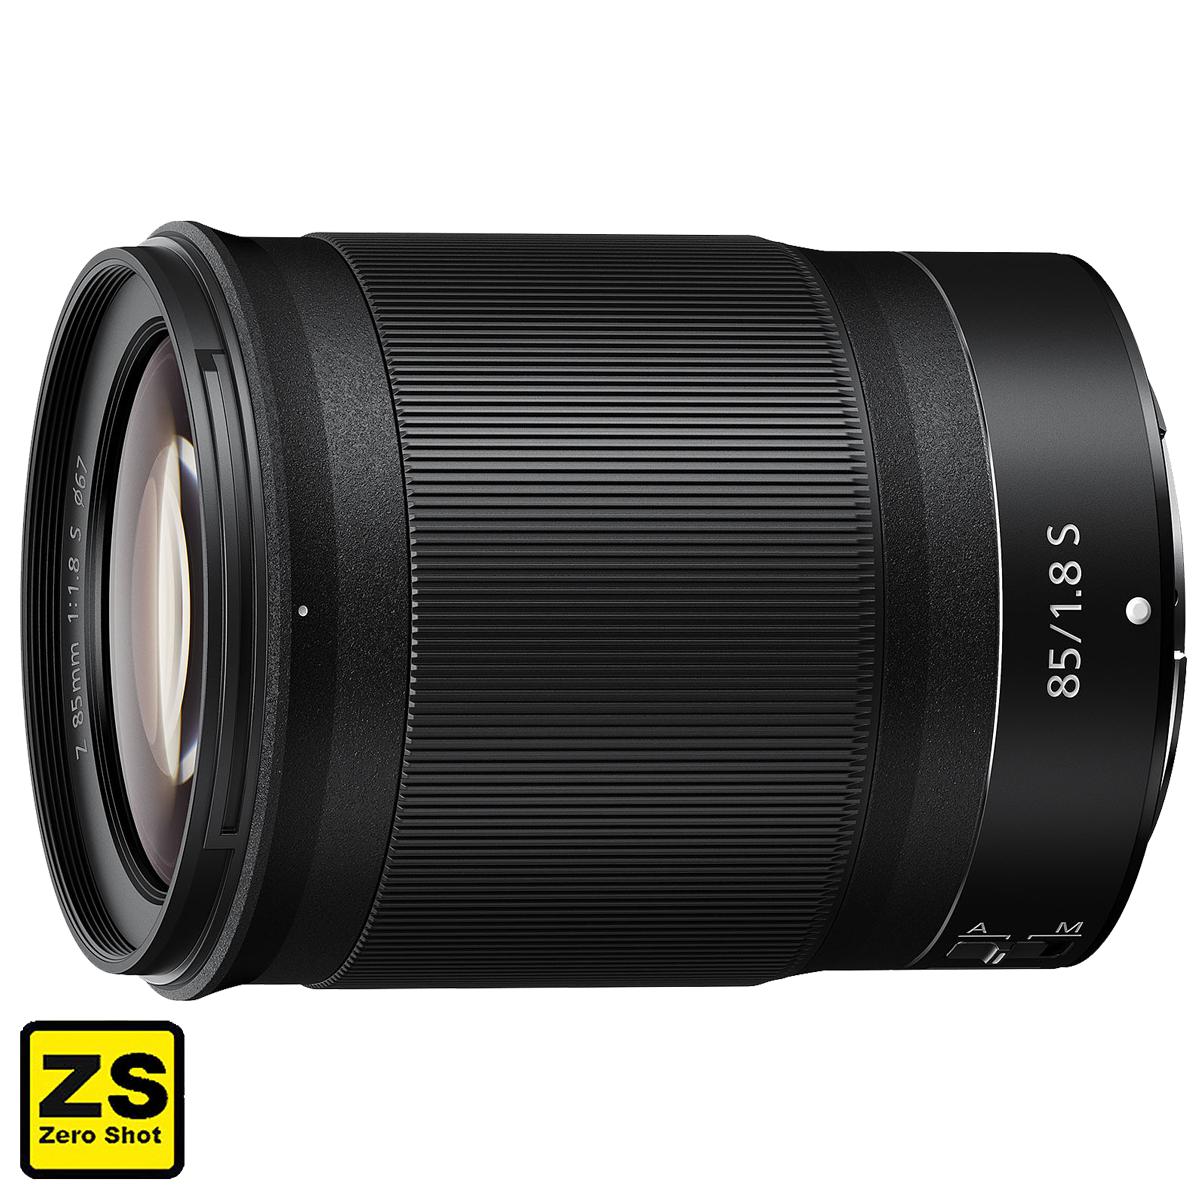 Objetiva NIKKOR Z 85 mm f/1.8 S (Zero Shot)